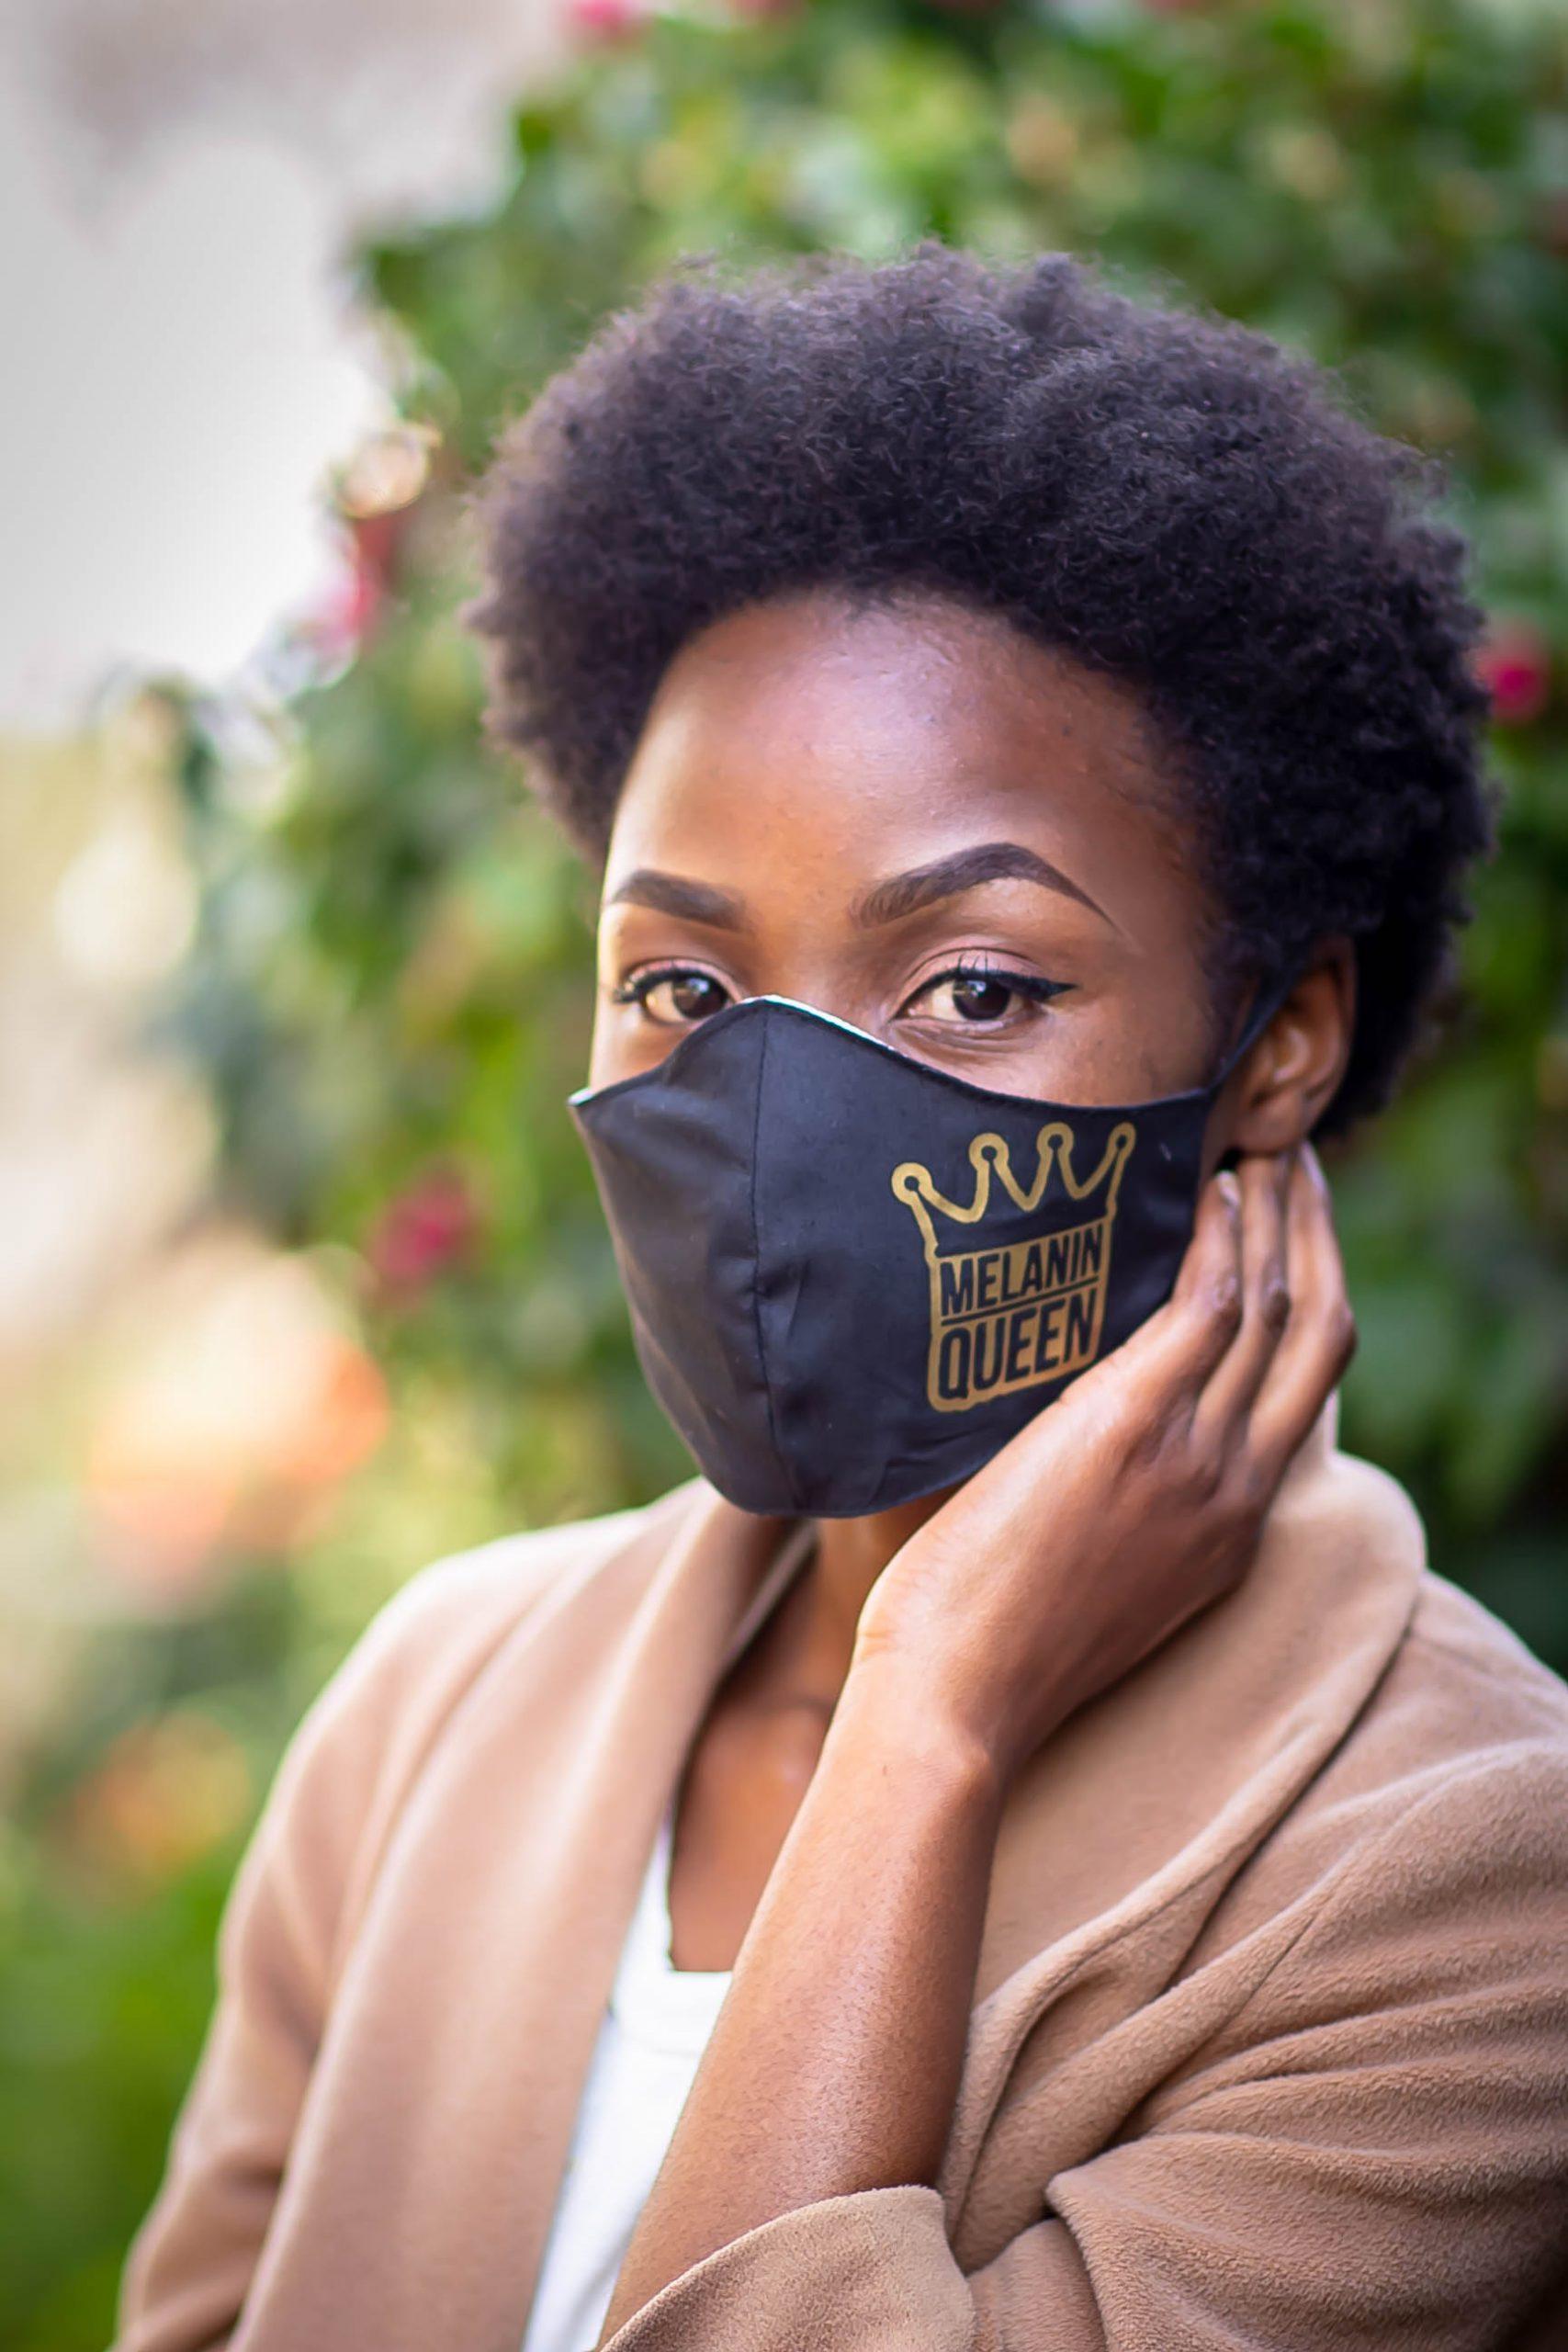 Gold Heat printed Melanin Queen Mask Kind Shop